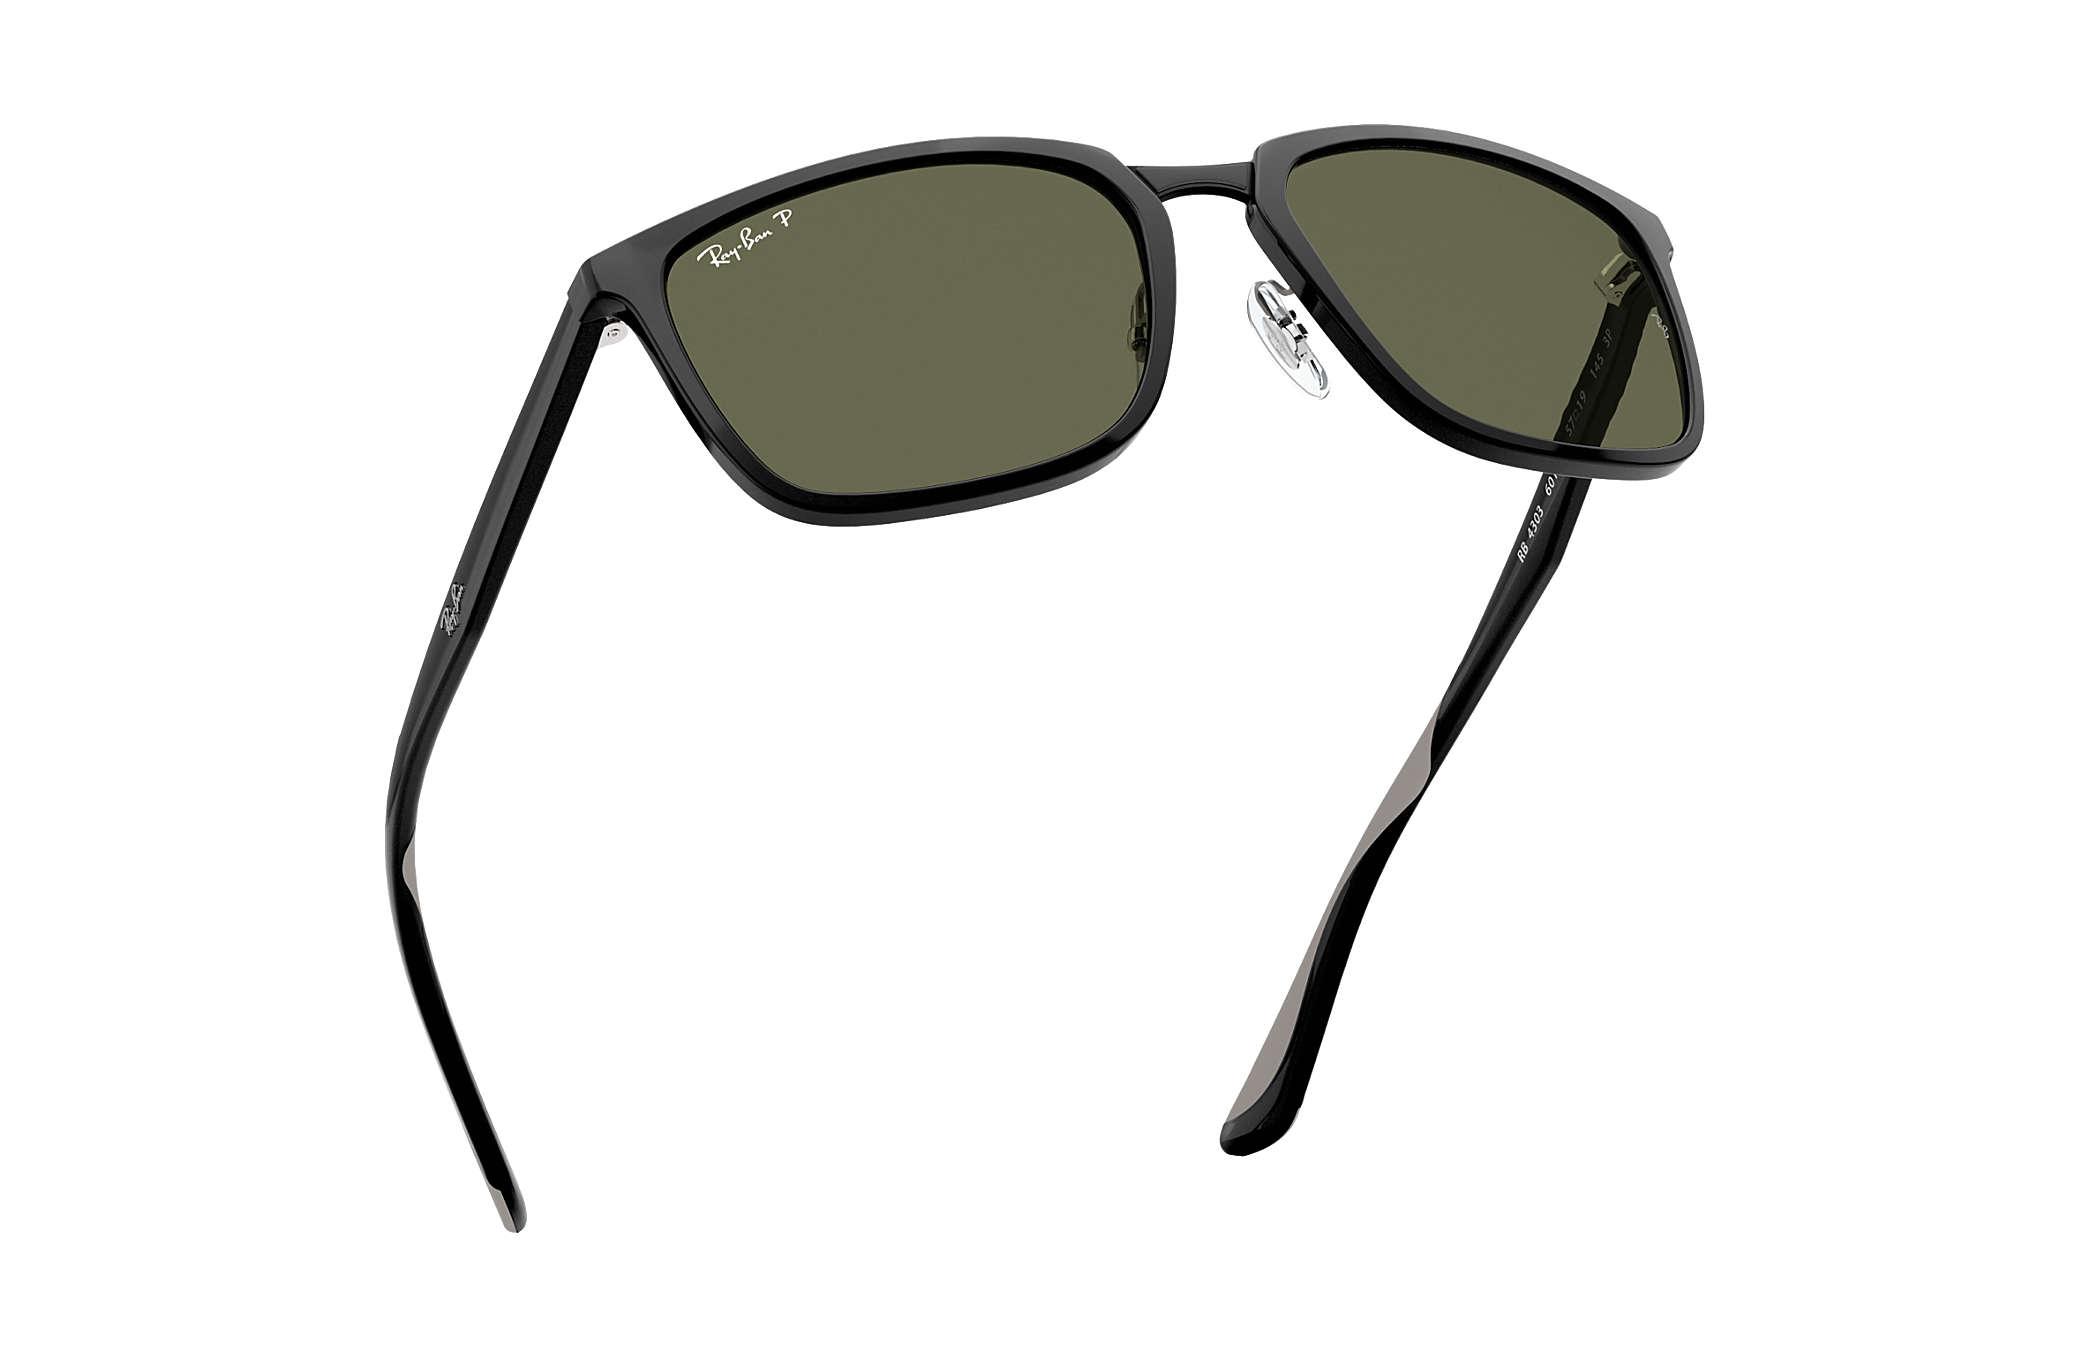 e3bb89939fe Ray-Ban RB4303 Black - Nylon - Green Polarized Lenses - 0RB4303601 ...